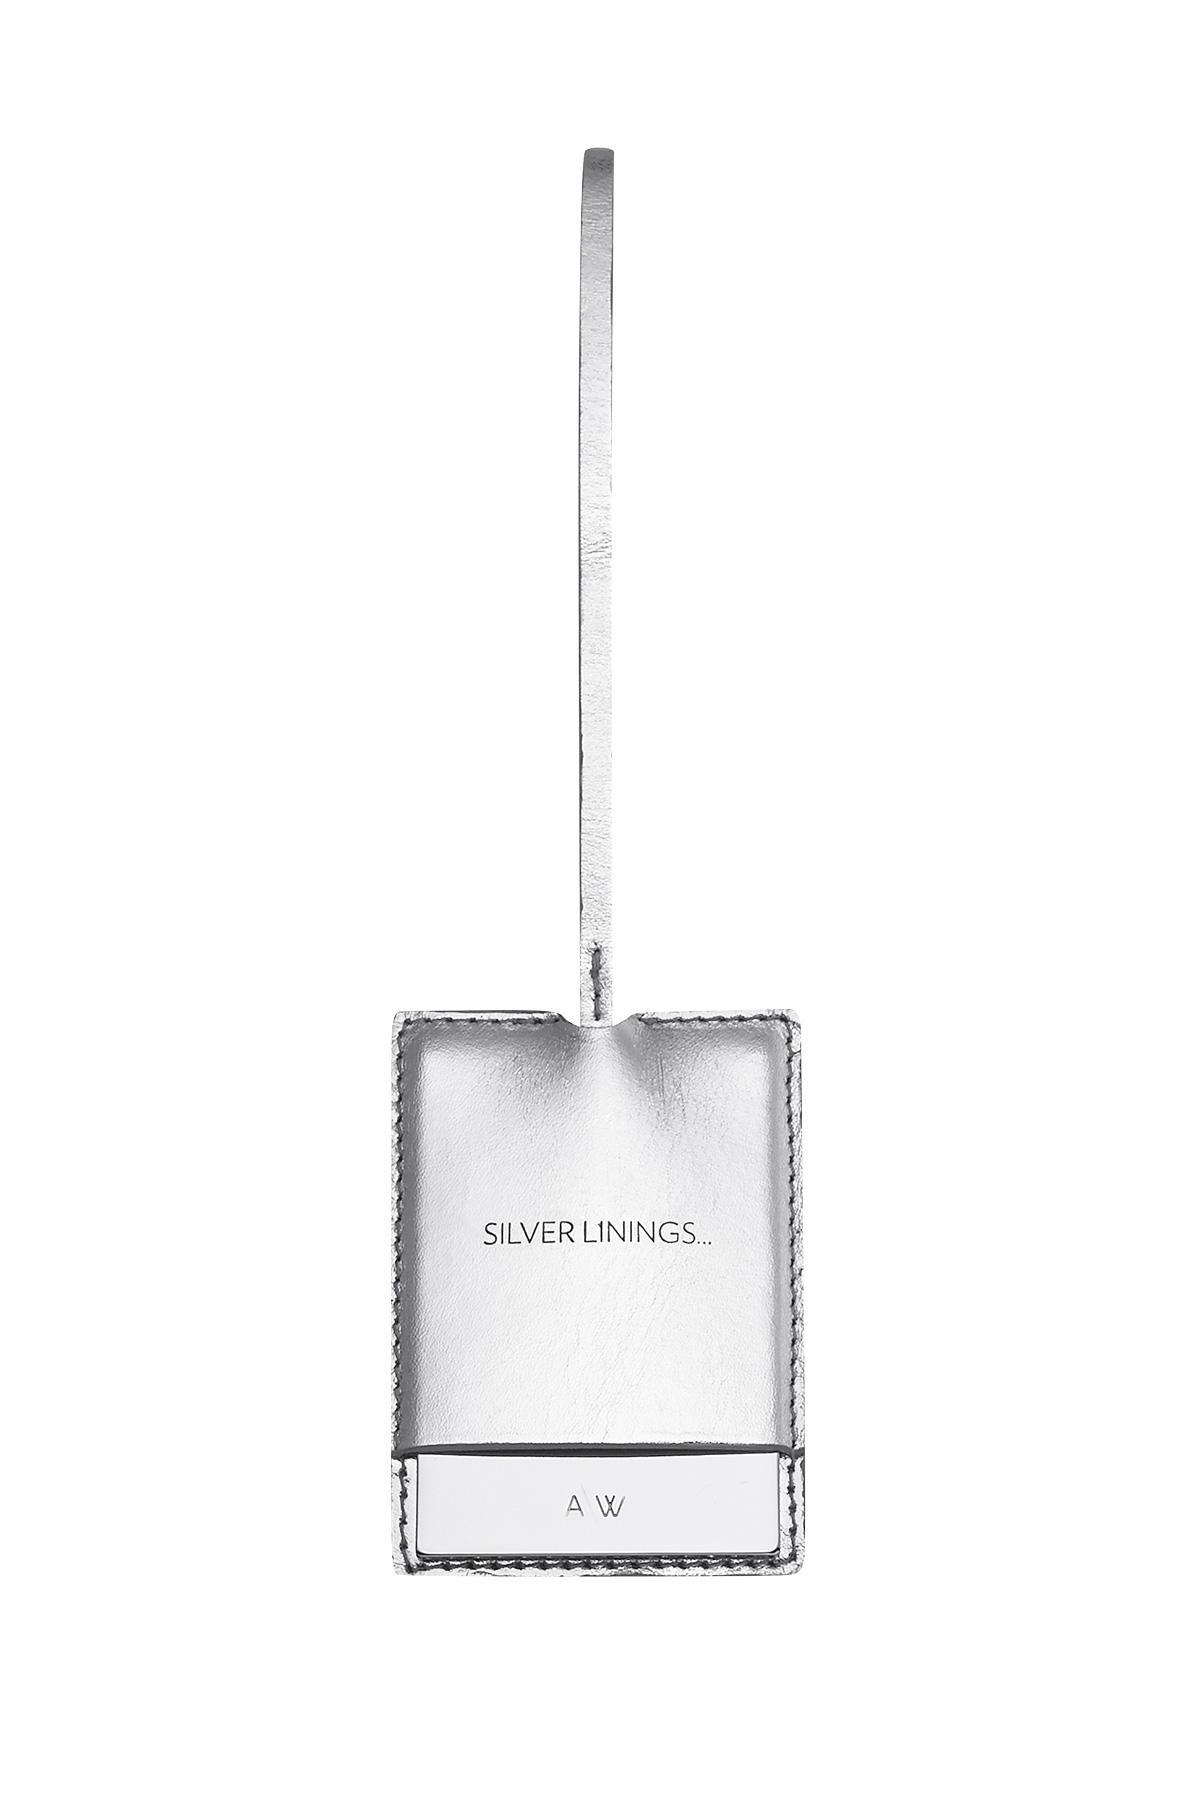 Amanda Wakeley Silver Linings Mirror Bag Charm Silver zpdfIFG